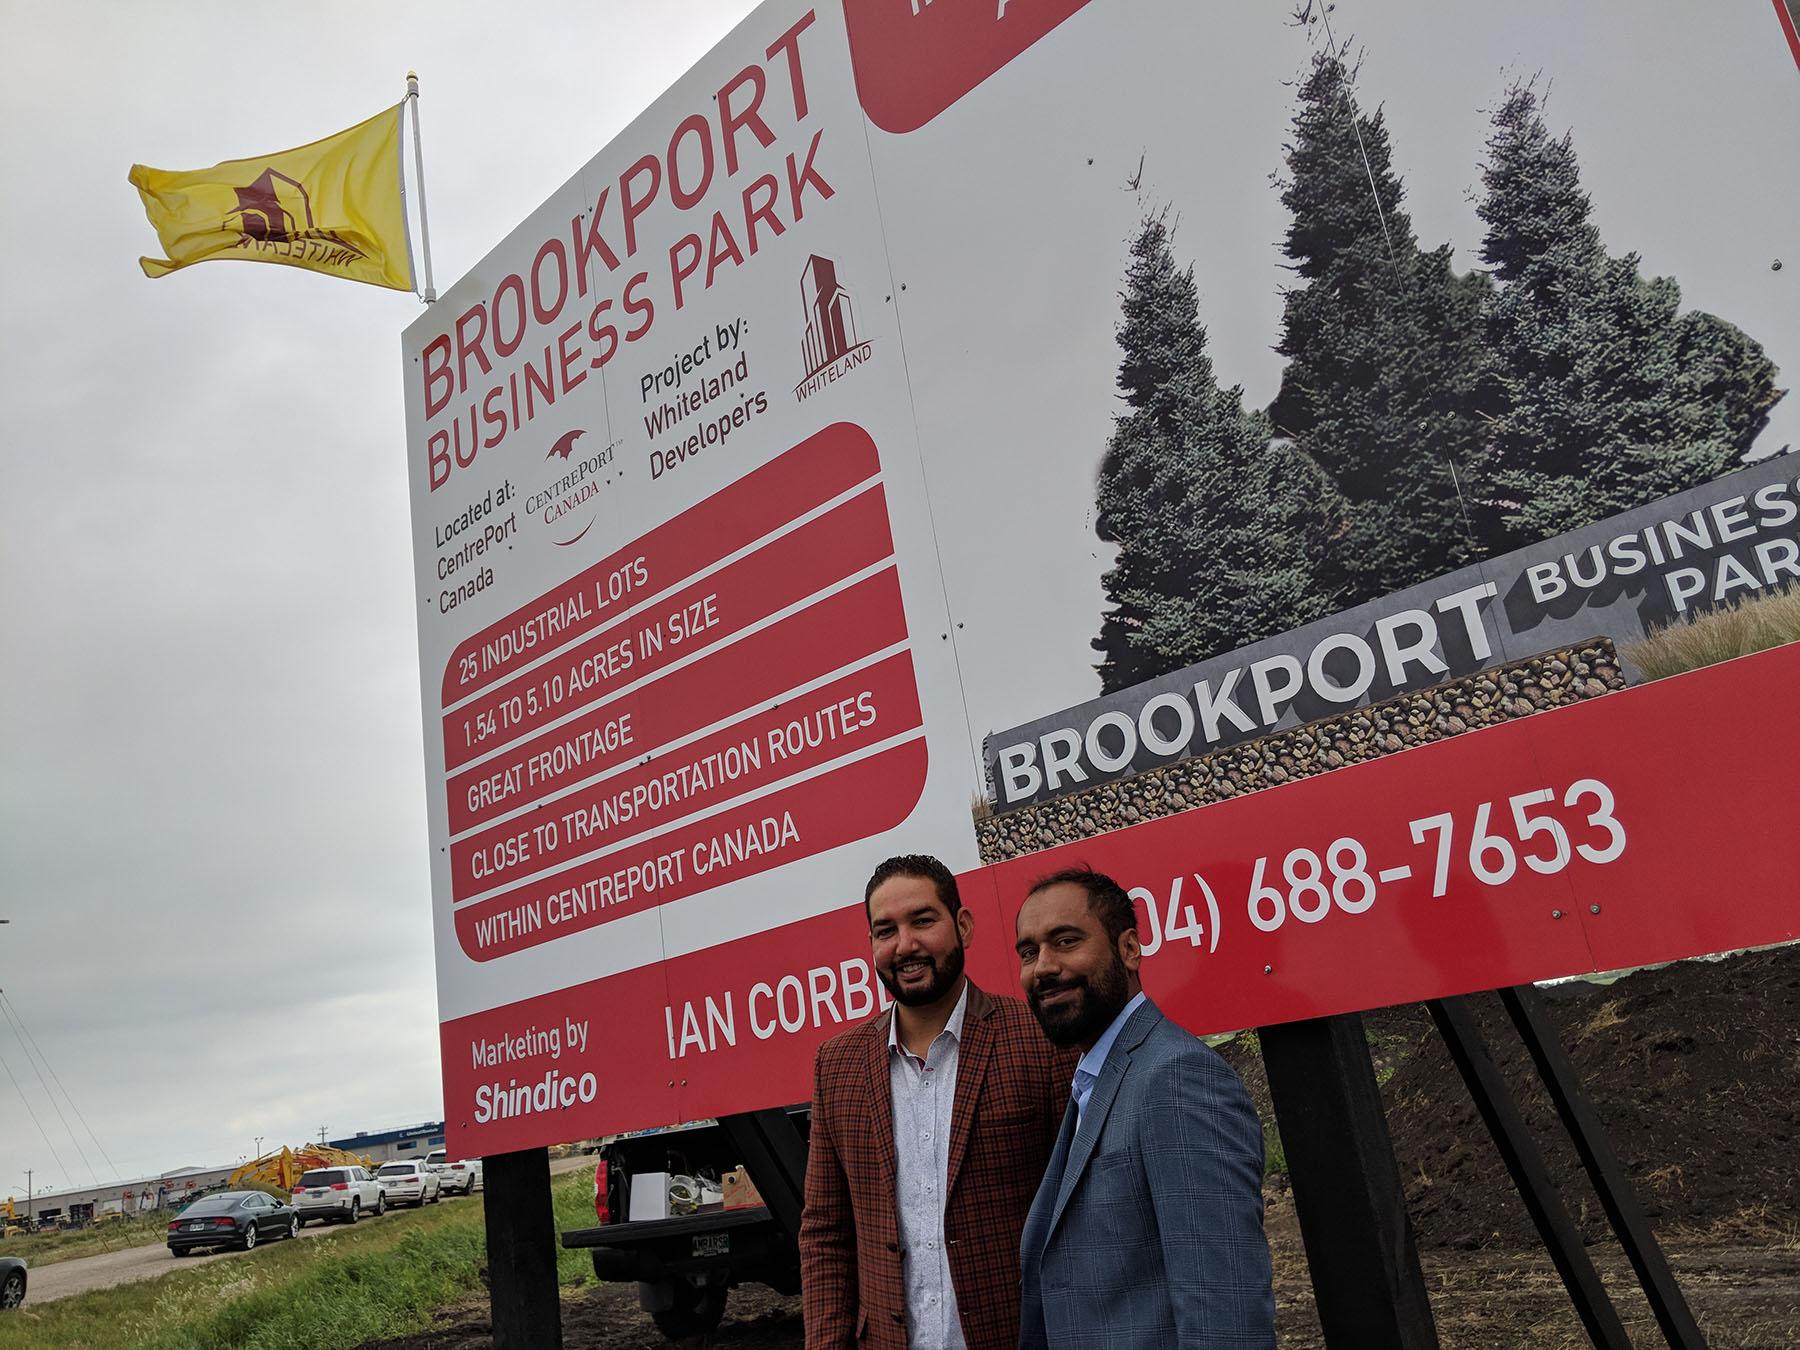 BrookPort Business Park